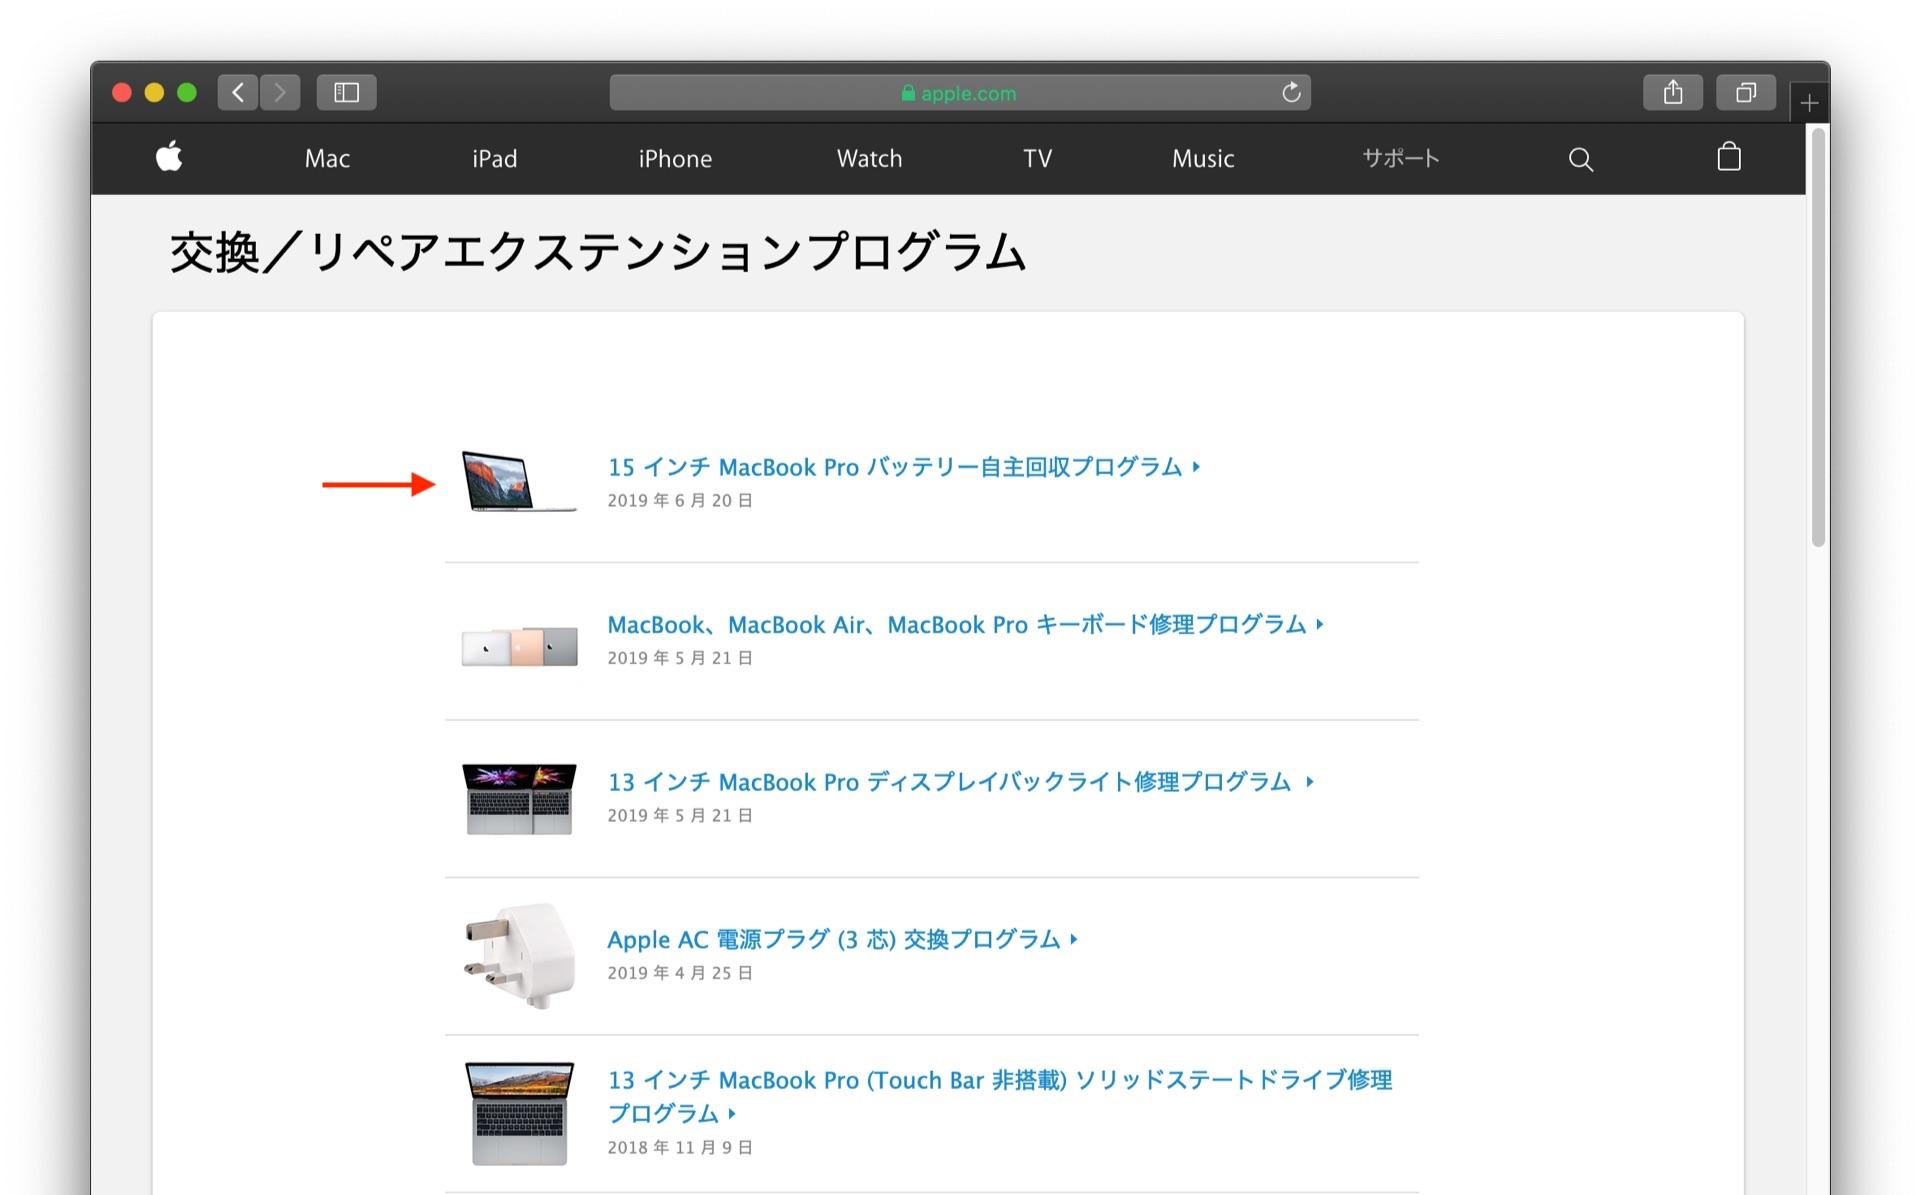 MacBook Pro (Retina, 15-inch, Mid 2015)のリコール